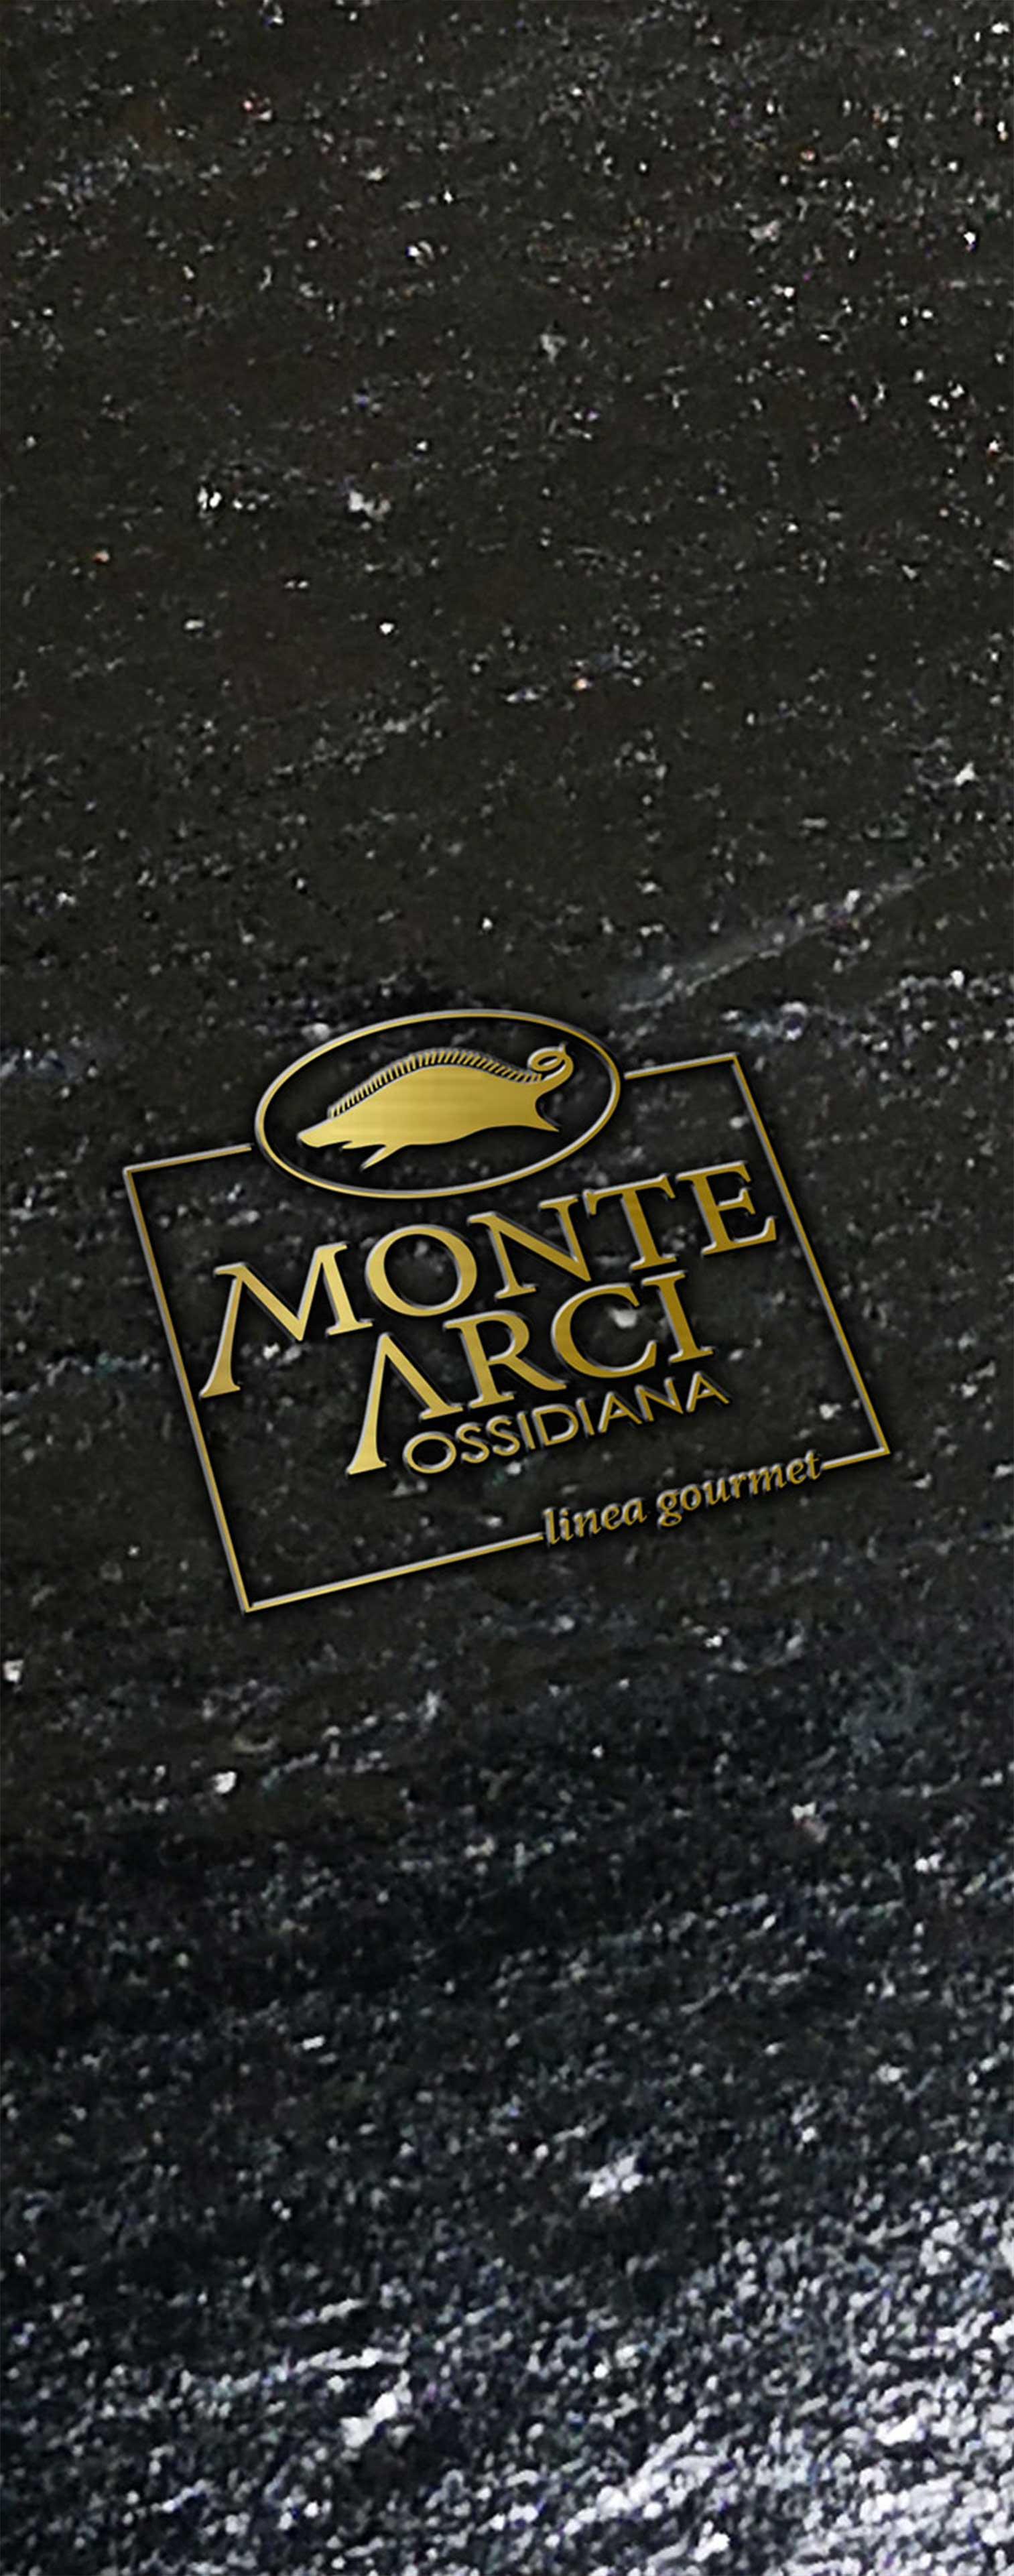 MONTE_ARCI_OSSIDIANA_VERT_150